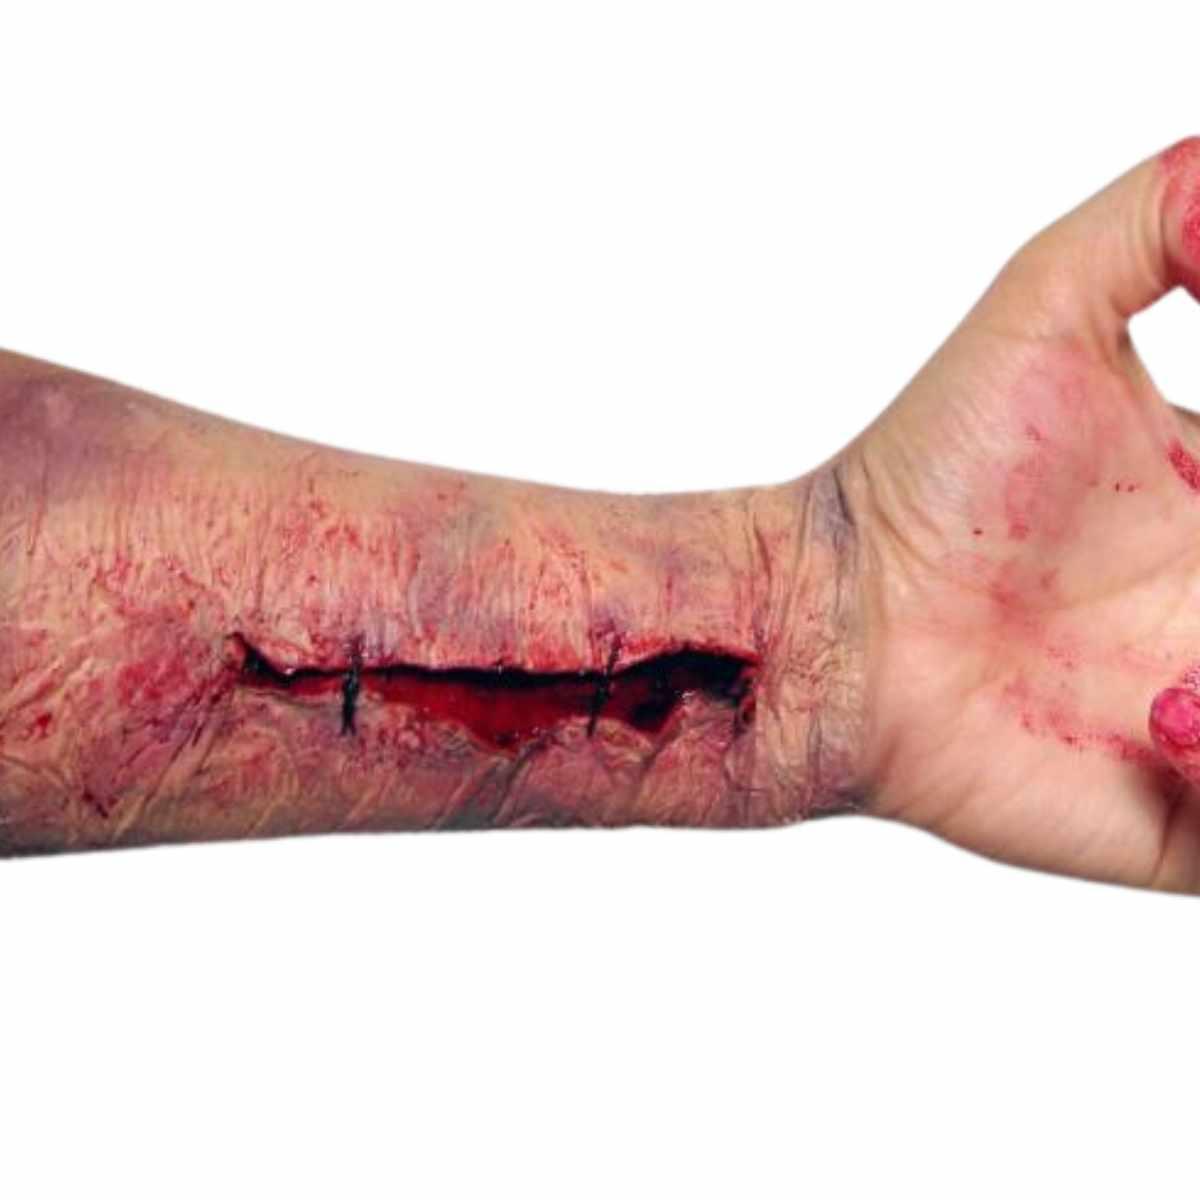 Kit Maquiagem Terror Profissional (Massa Mágica + Queimadura Artística + Sangue Falso)